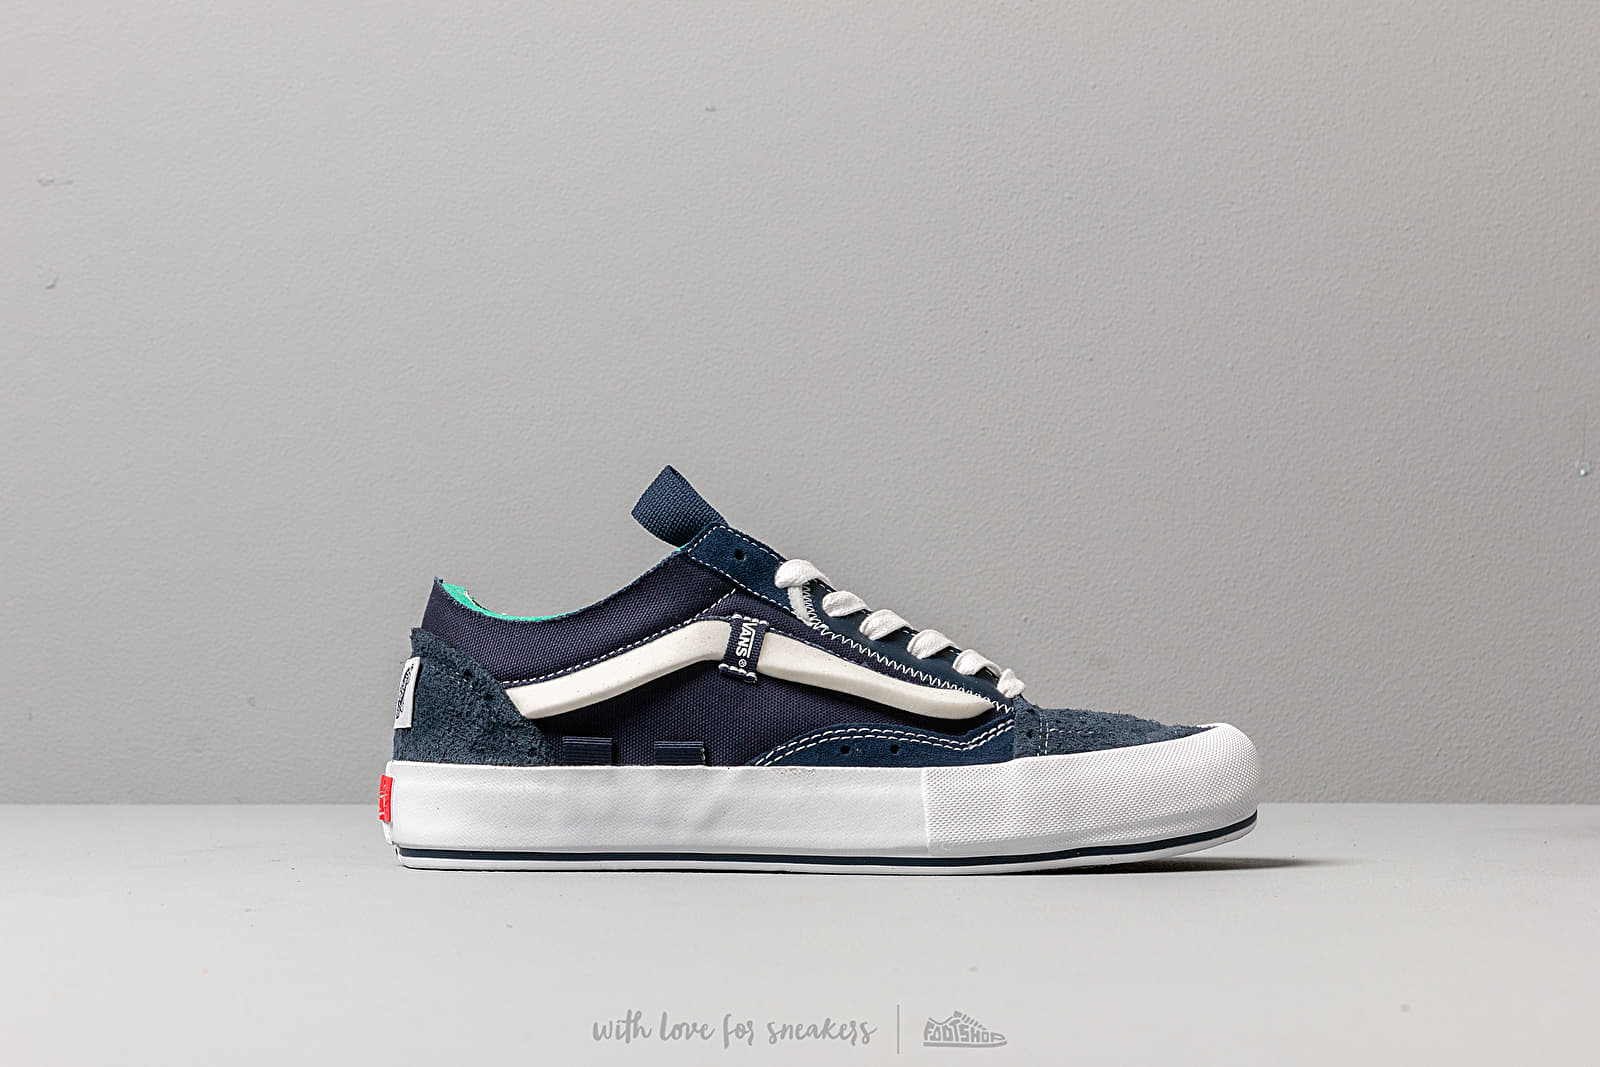 Chaussures et baskets homme Vans Old Skool Cap LX (Regrind